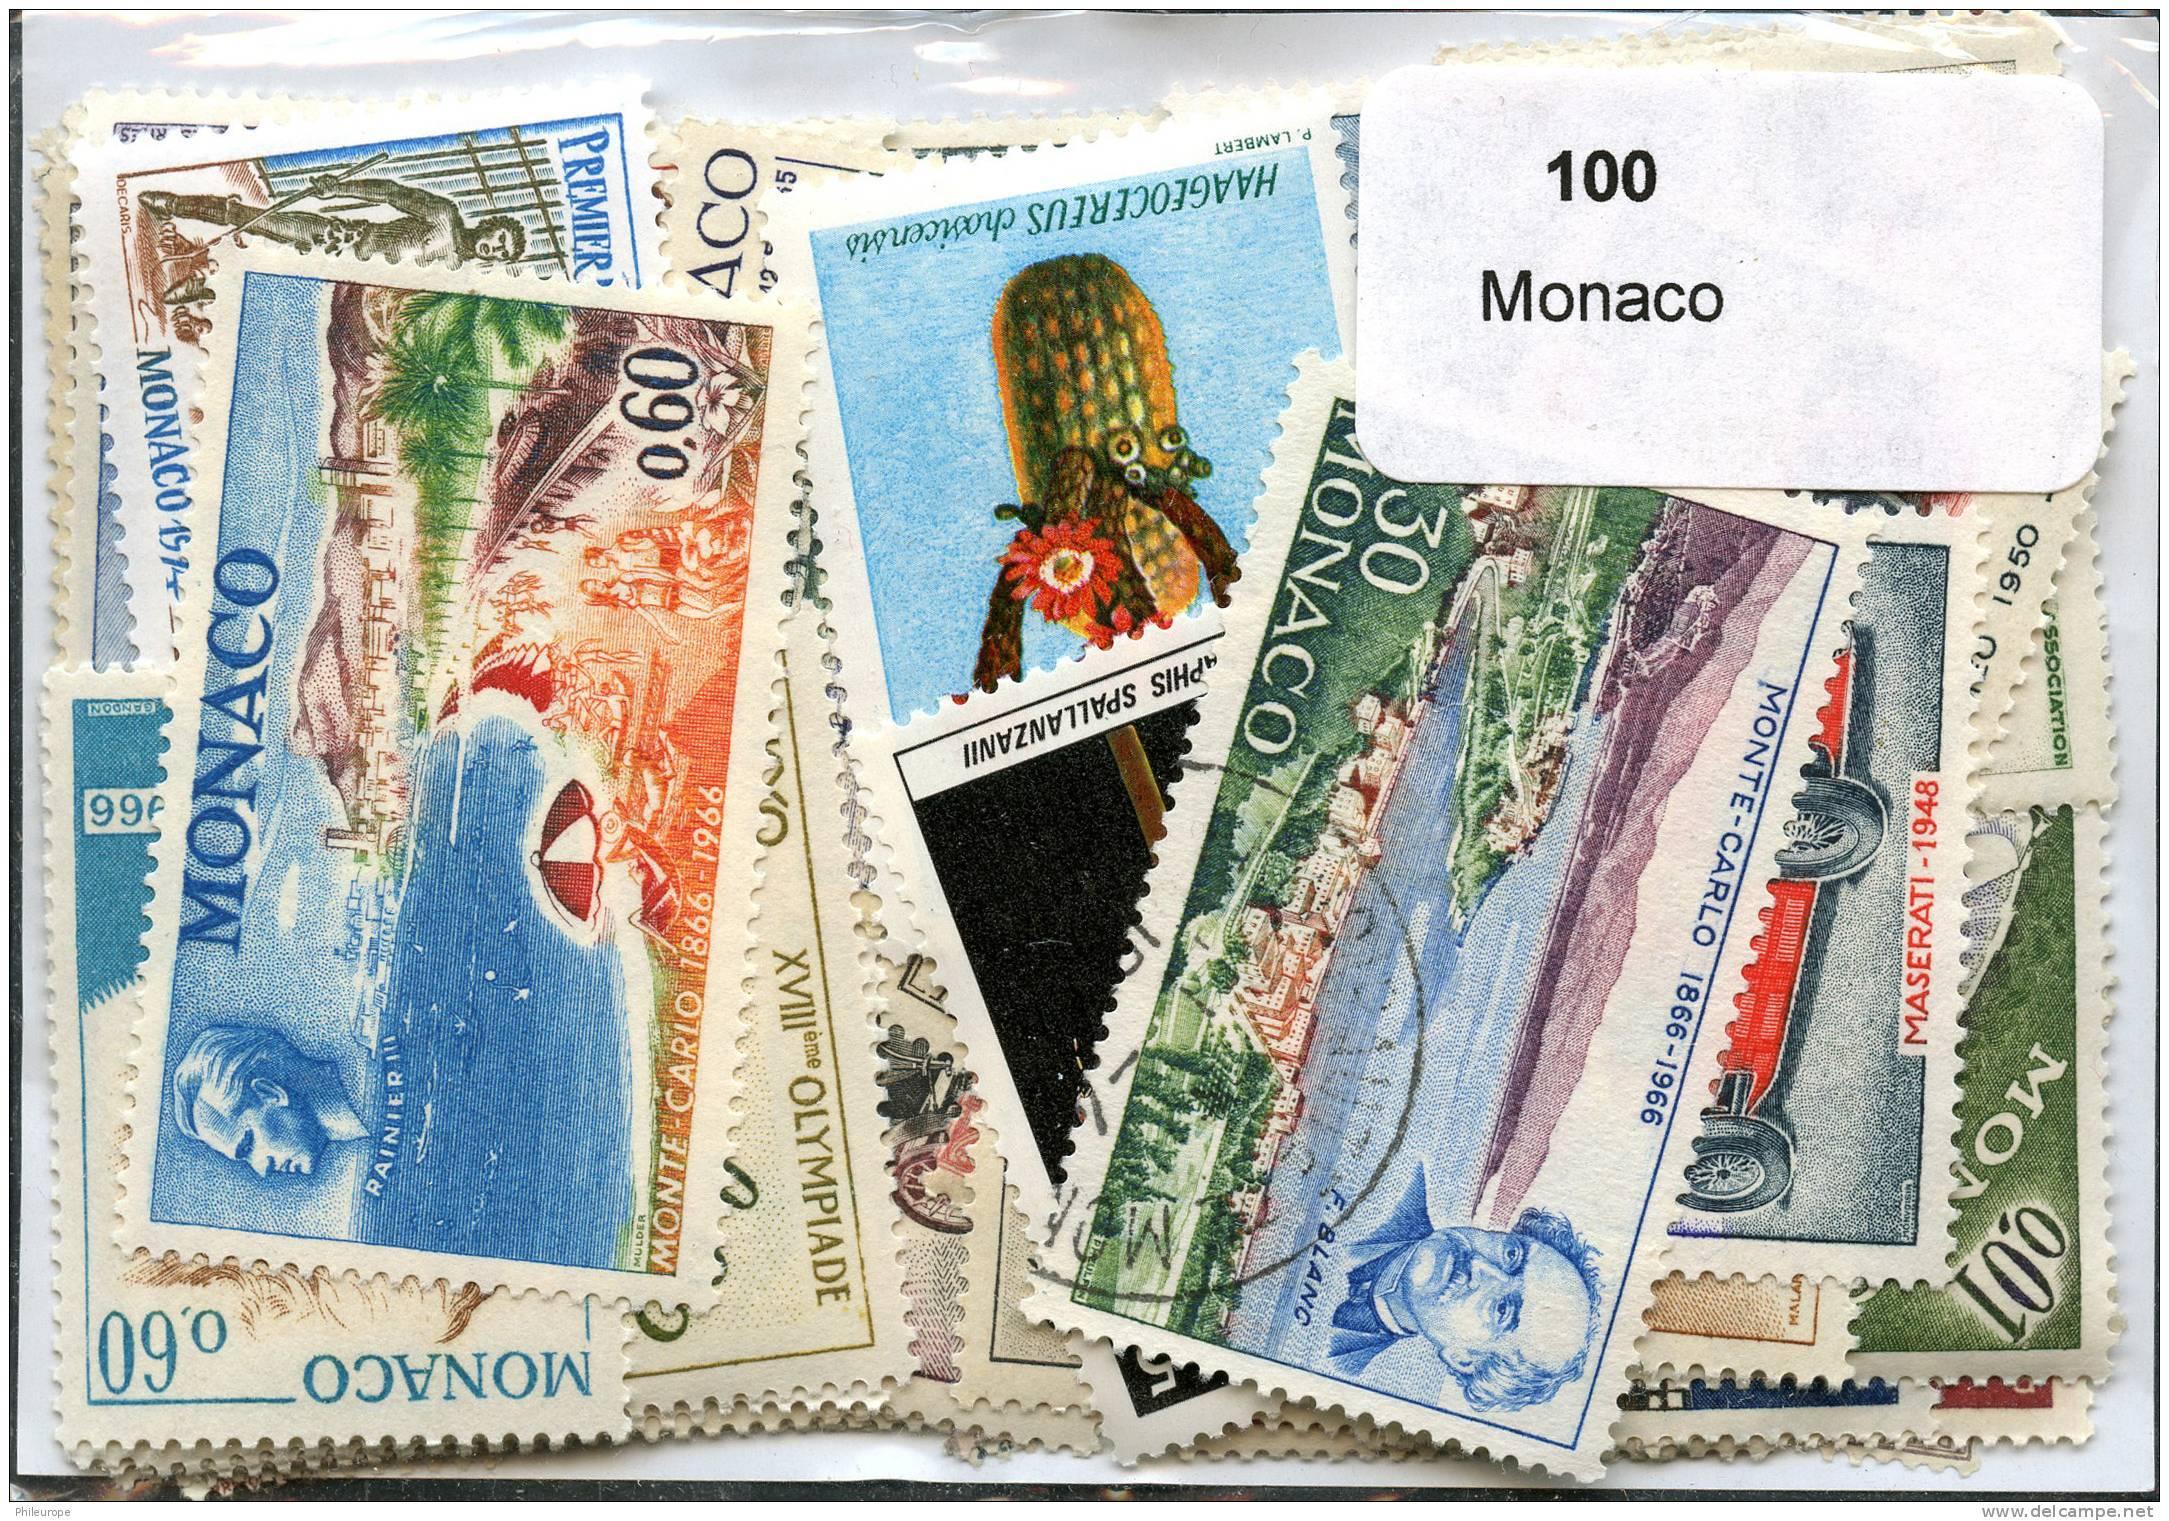 Lot 100 Timbres Monaco - Timbres